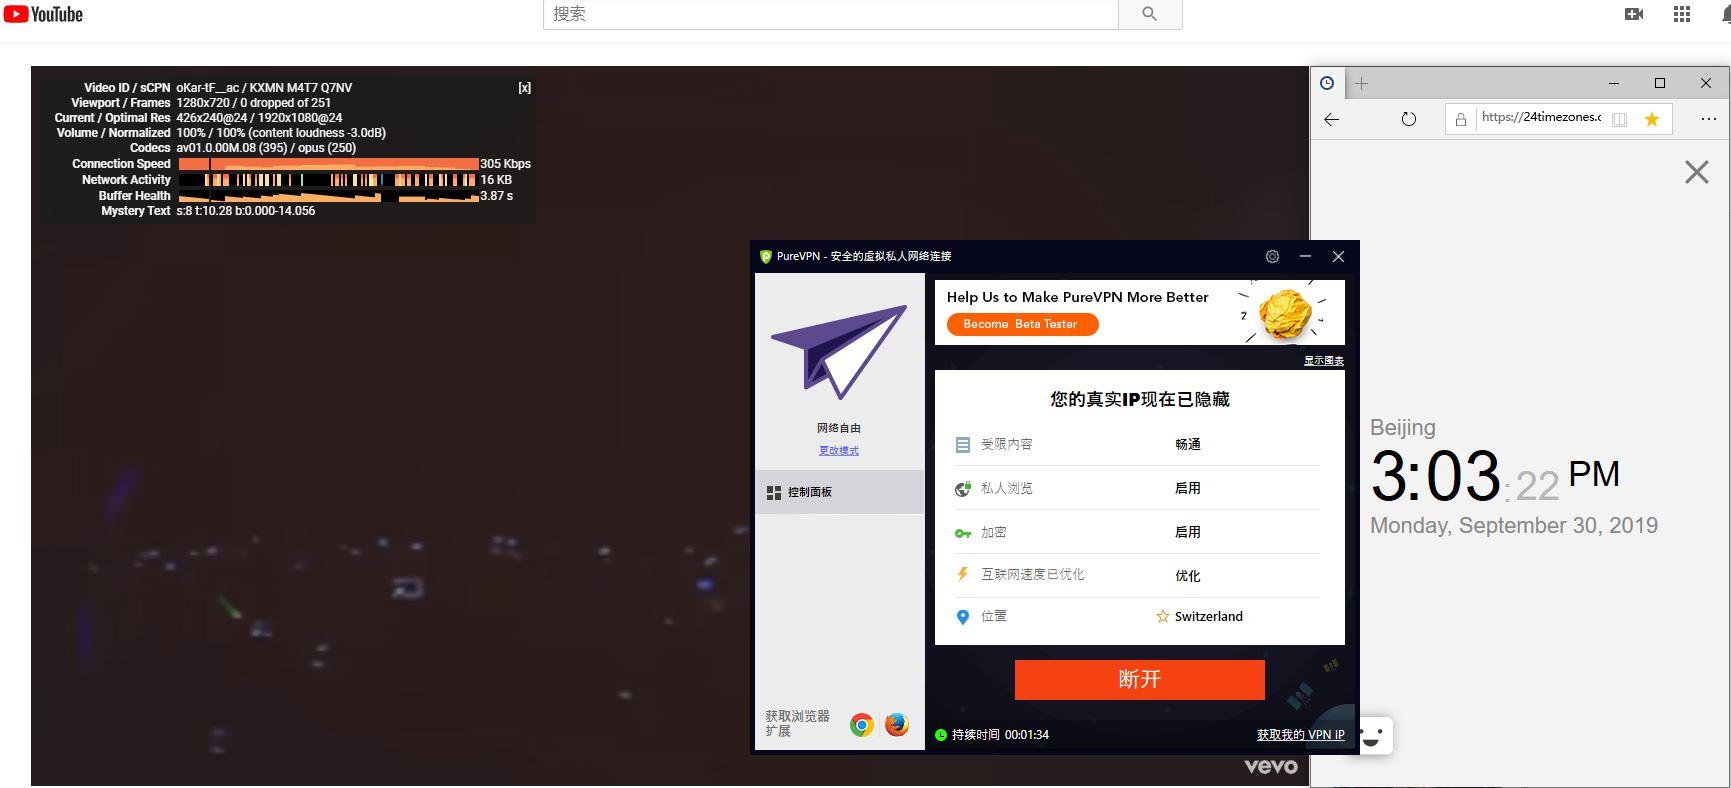 PureVPN Windows Switaerland 服务器 中国VPN翻墙 科学上网 YouTube测速-20190930